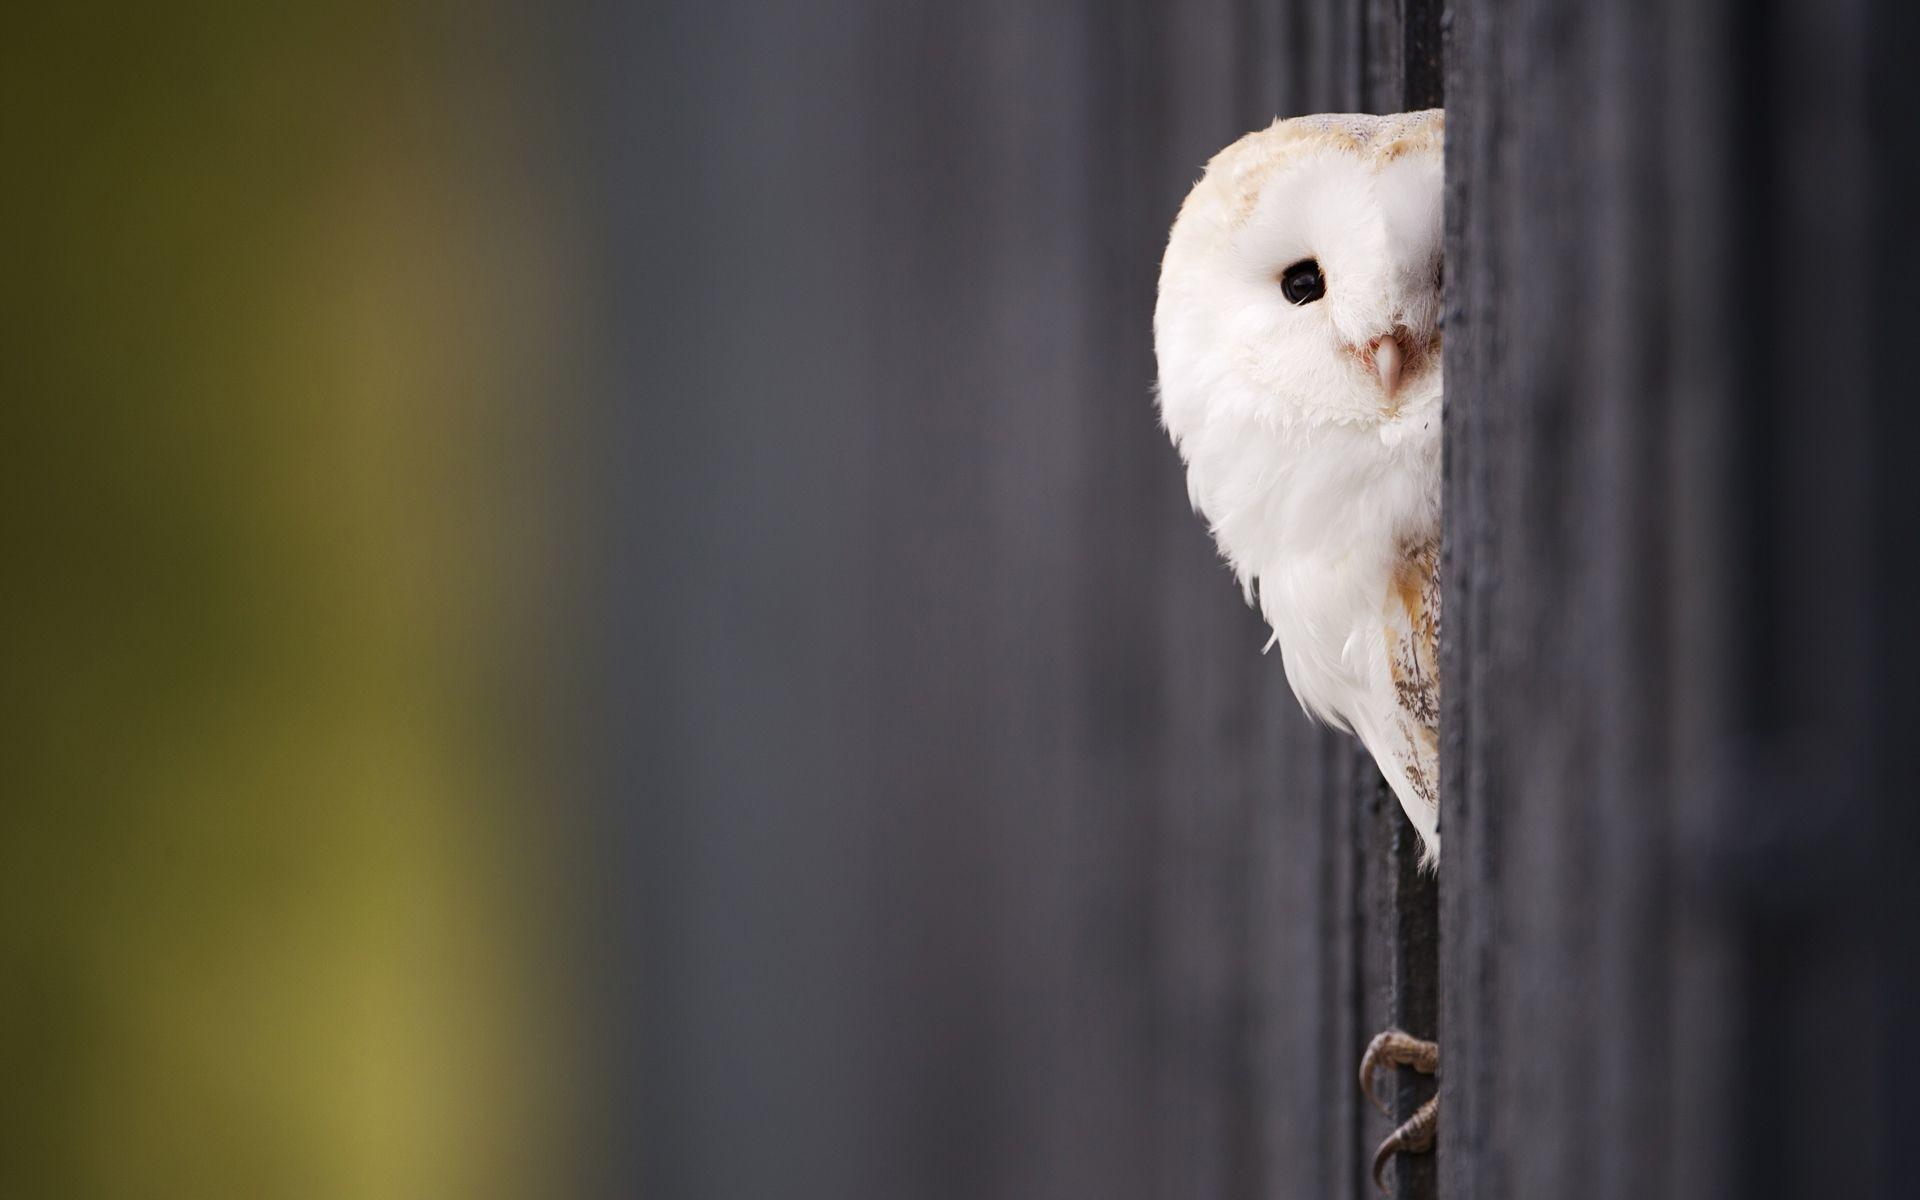 Cute Colorful Owl Wallpaper Full HD